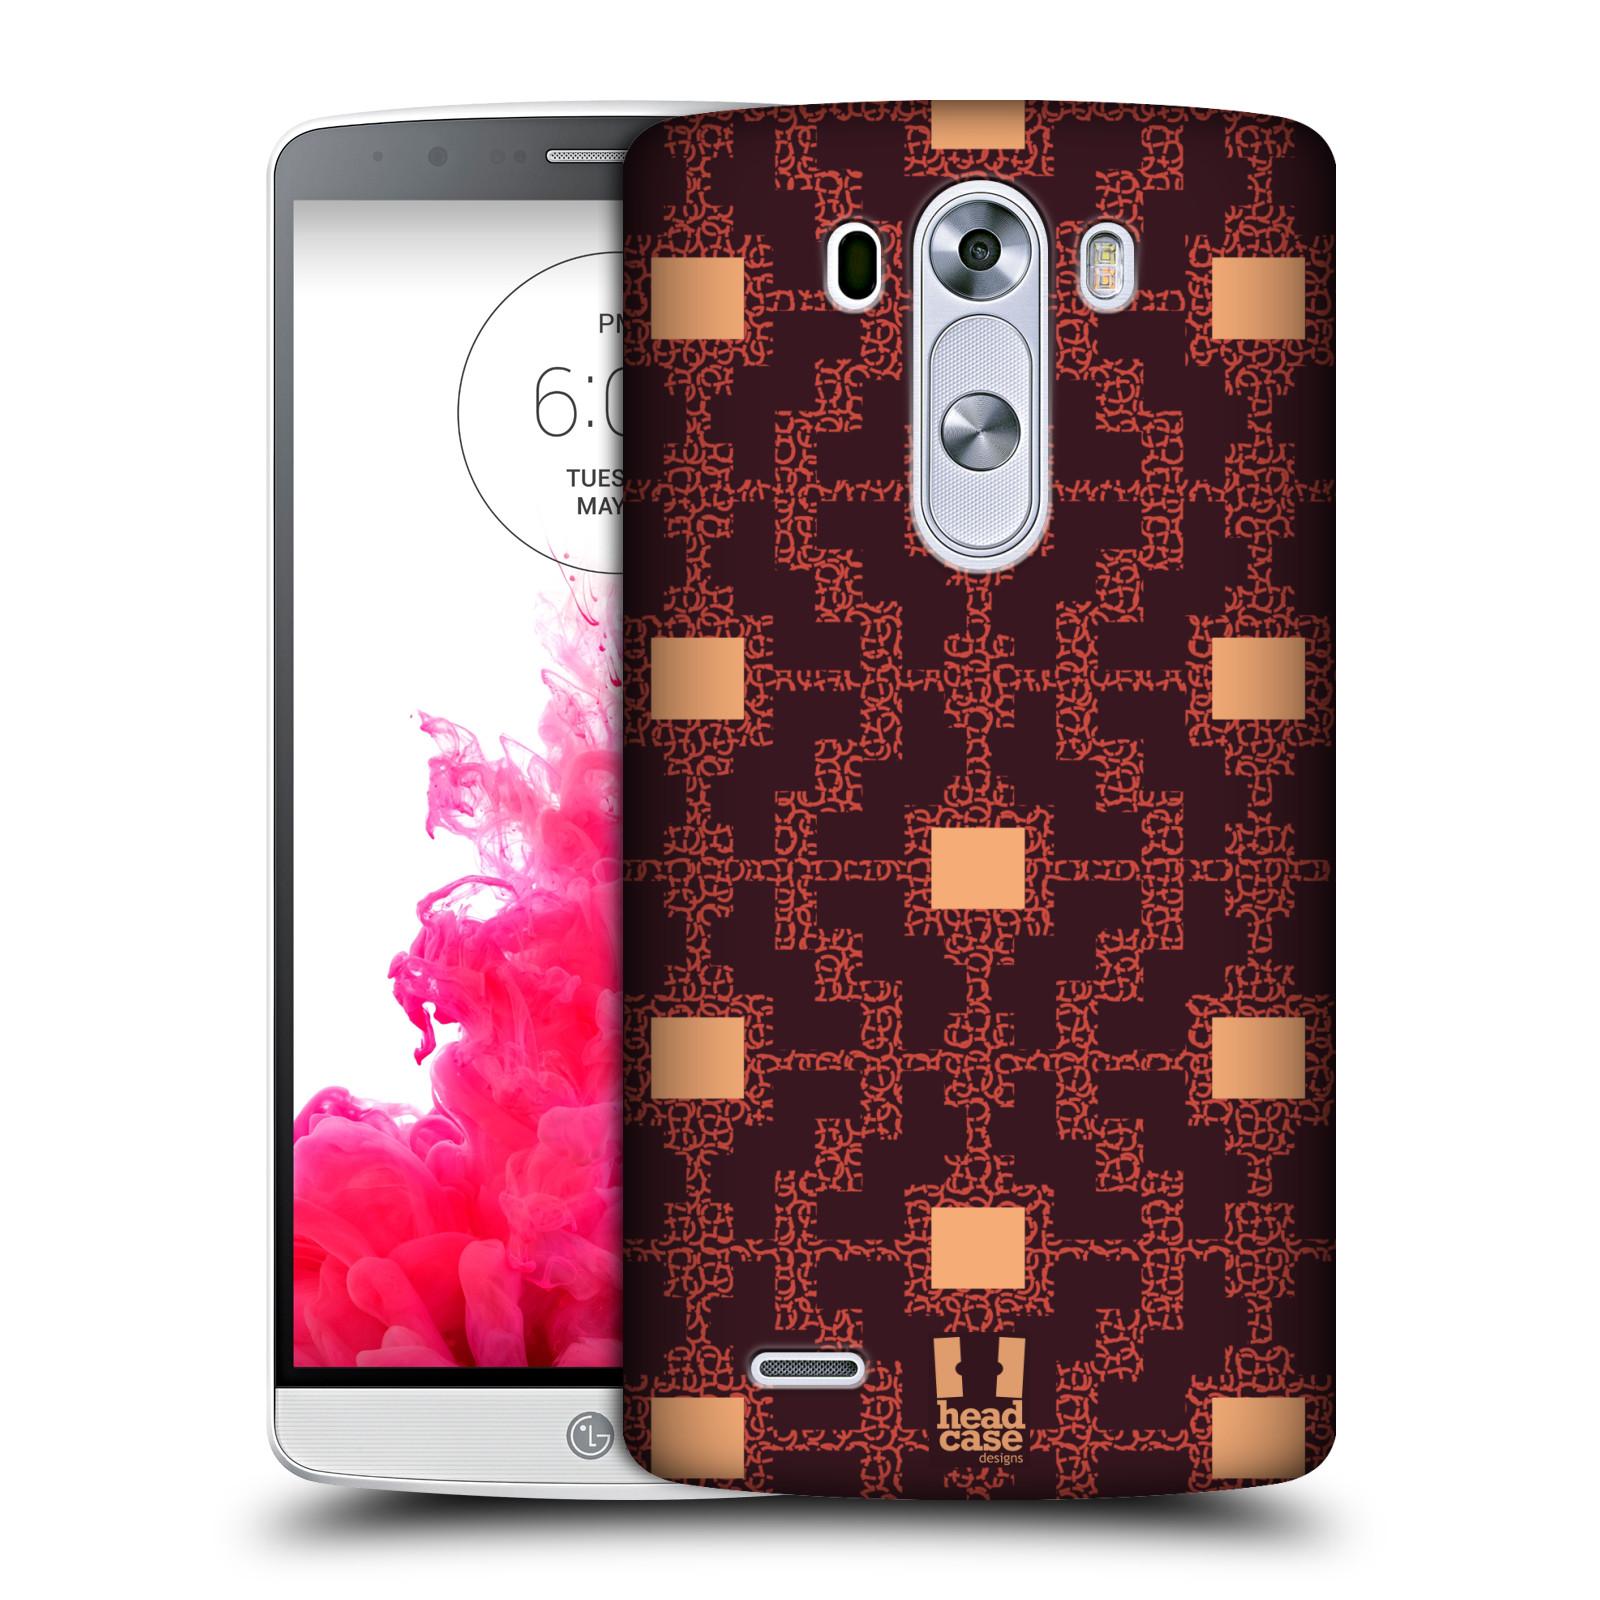 HEAD-CASE-DESIGNS-GLAM-AMAZON-HARD-BACK-CASE-FOR-LG-PHONES-1